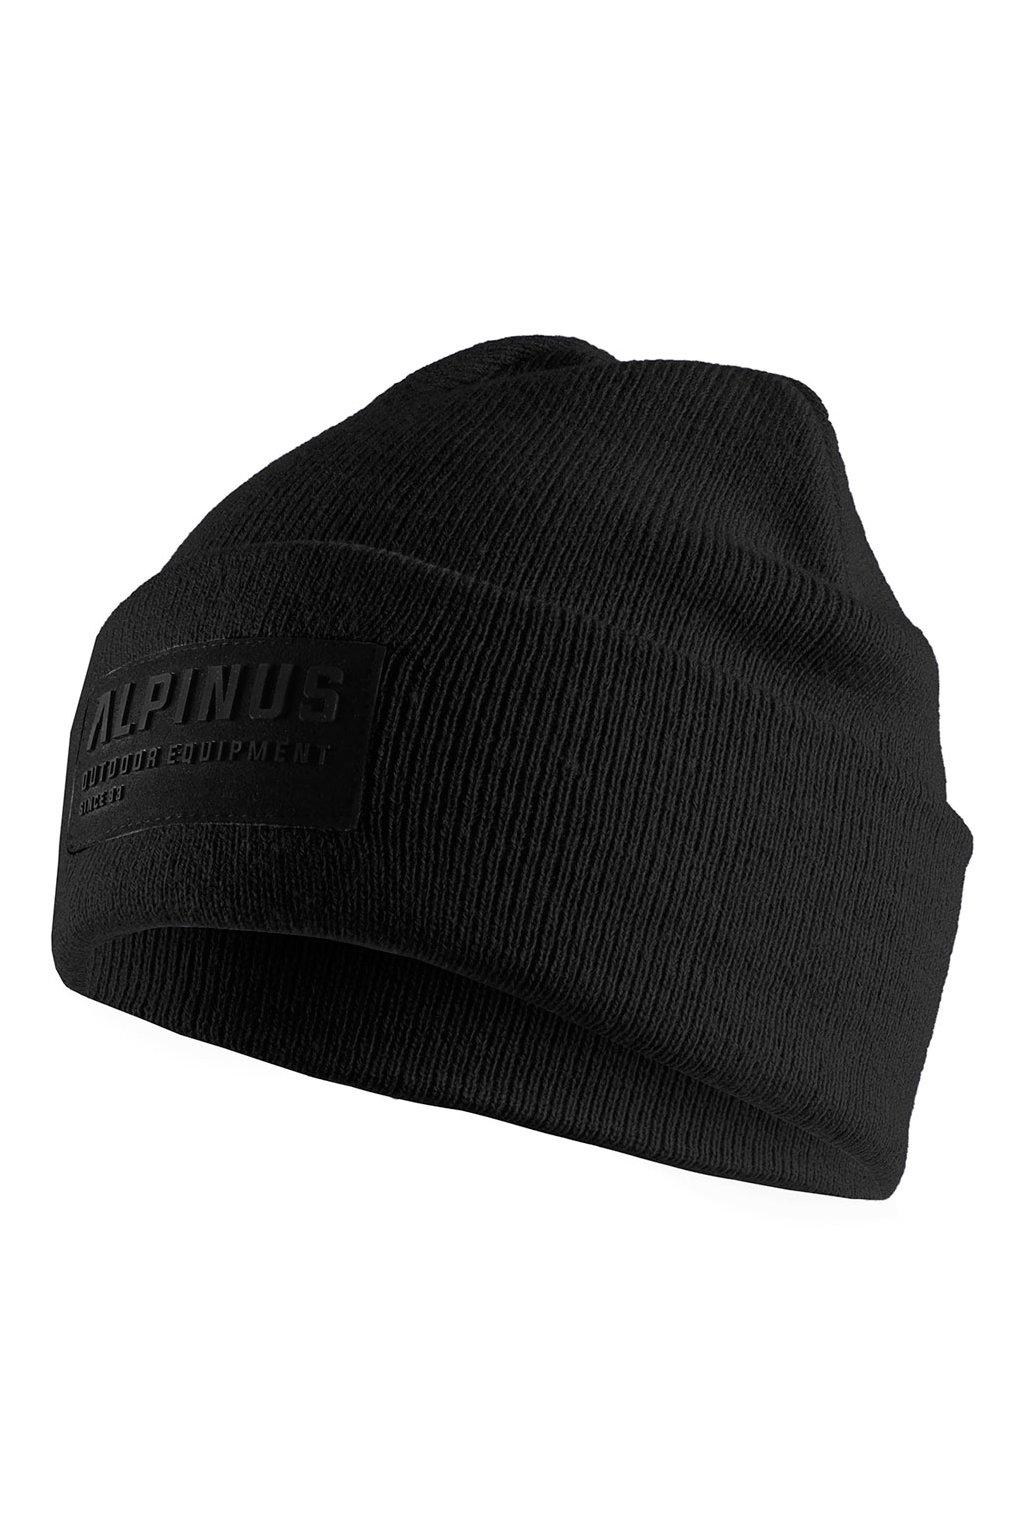 Čiapka Alpinus Oslo Cuffed Beanie čierna AWH006